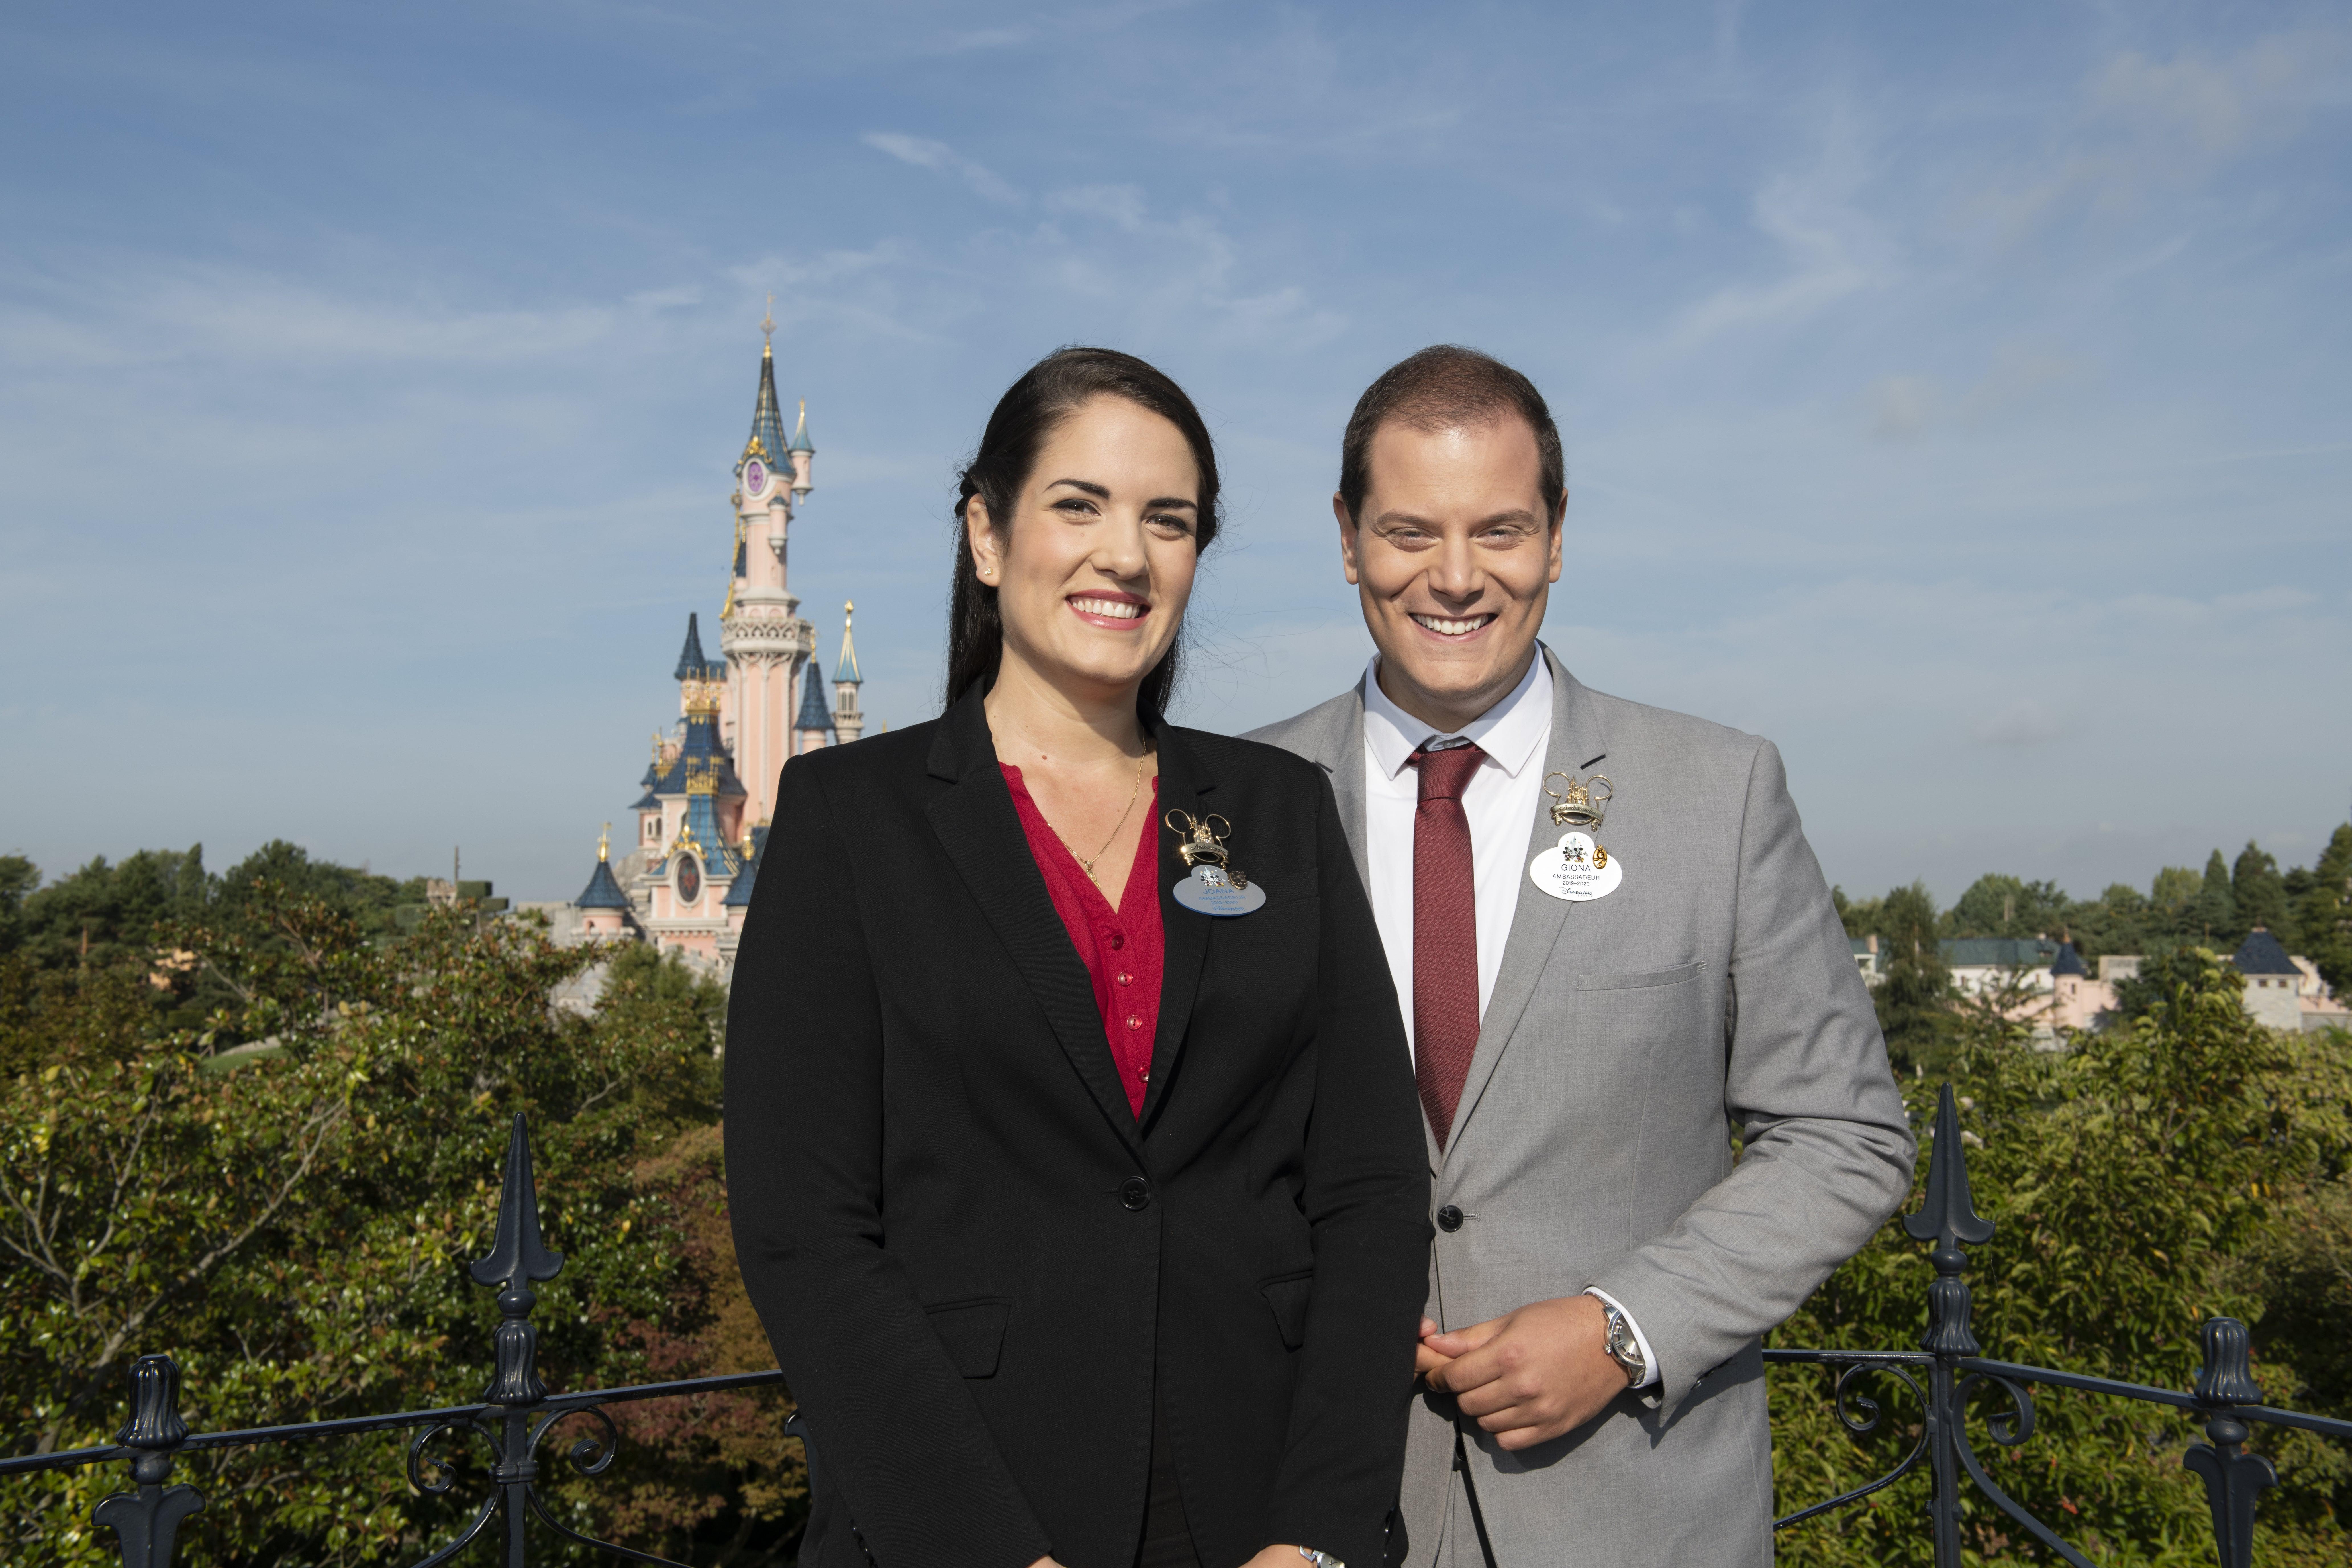 Joana Afonso Santiago et Giona Prevete, Ambassadeurs de Disneyland Paris